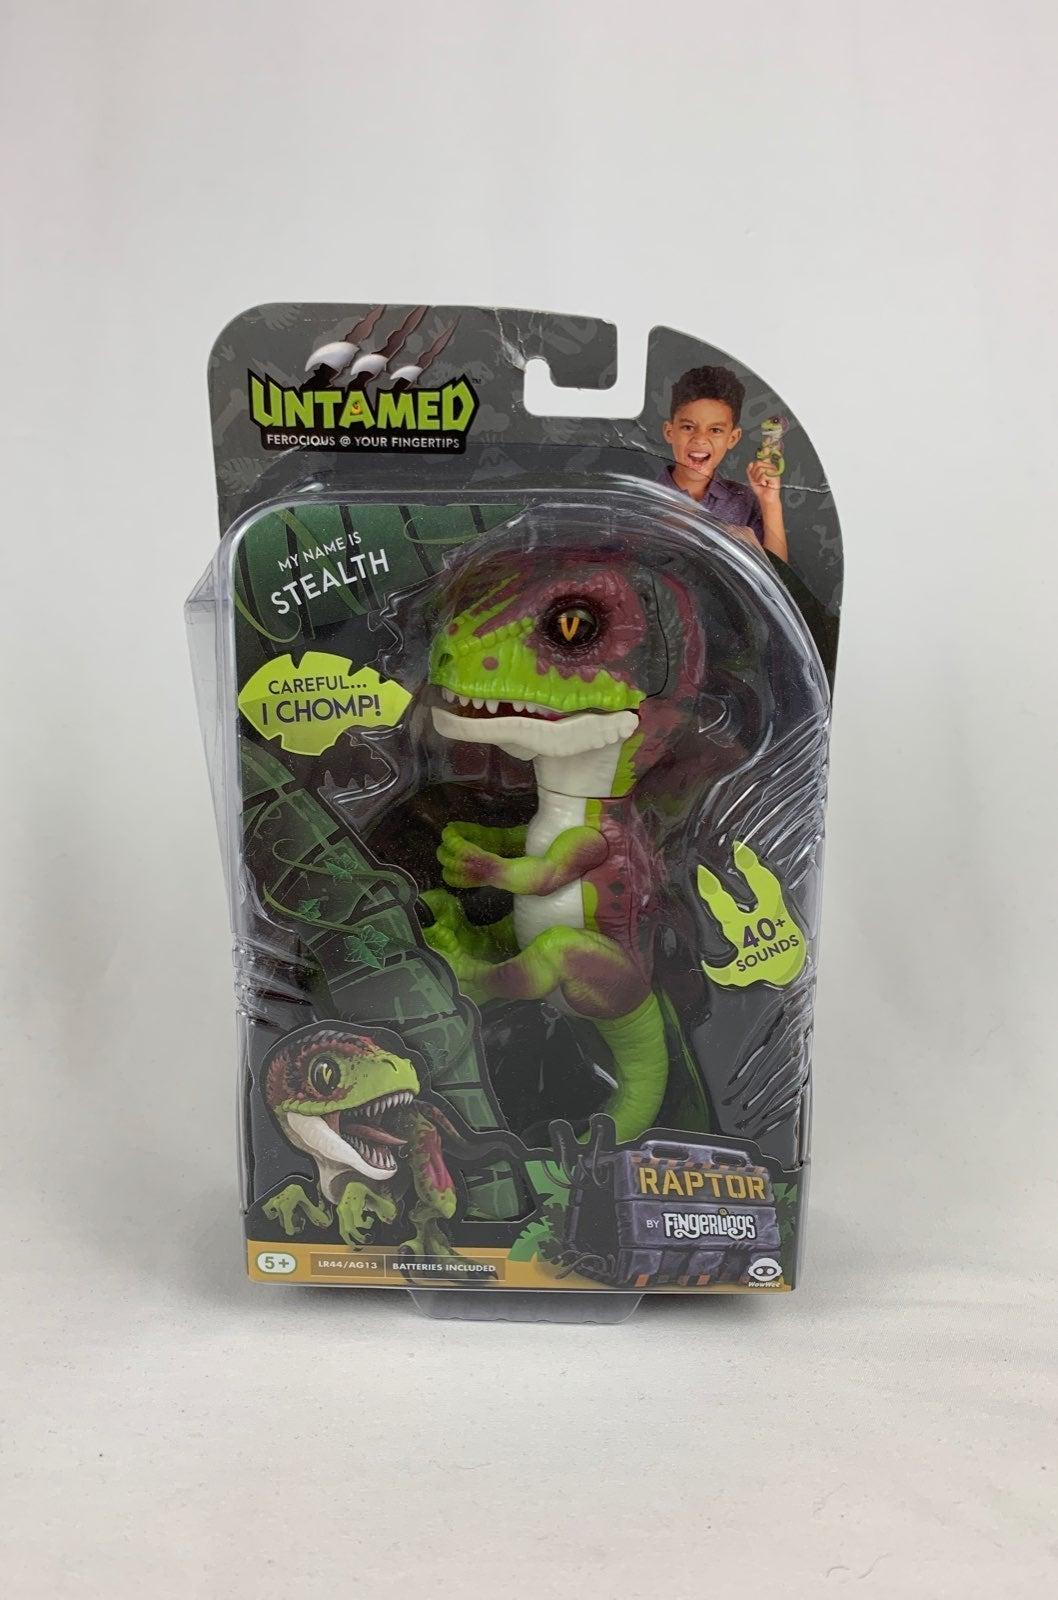 WowWee Untamed Raptor - Stealth